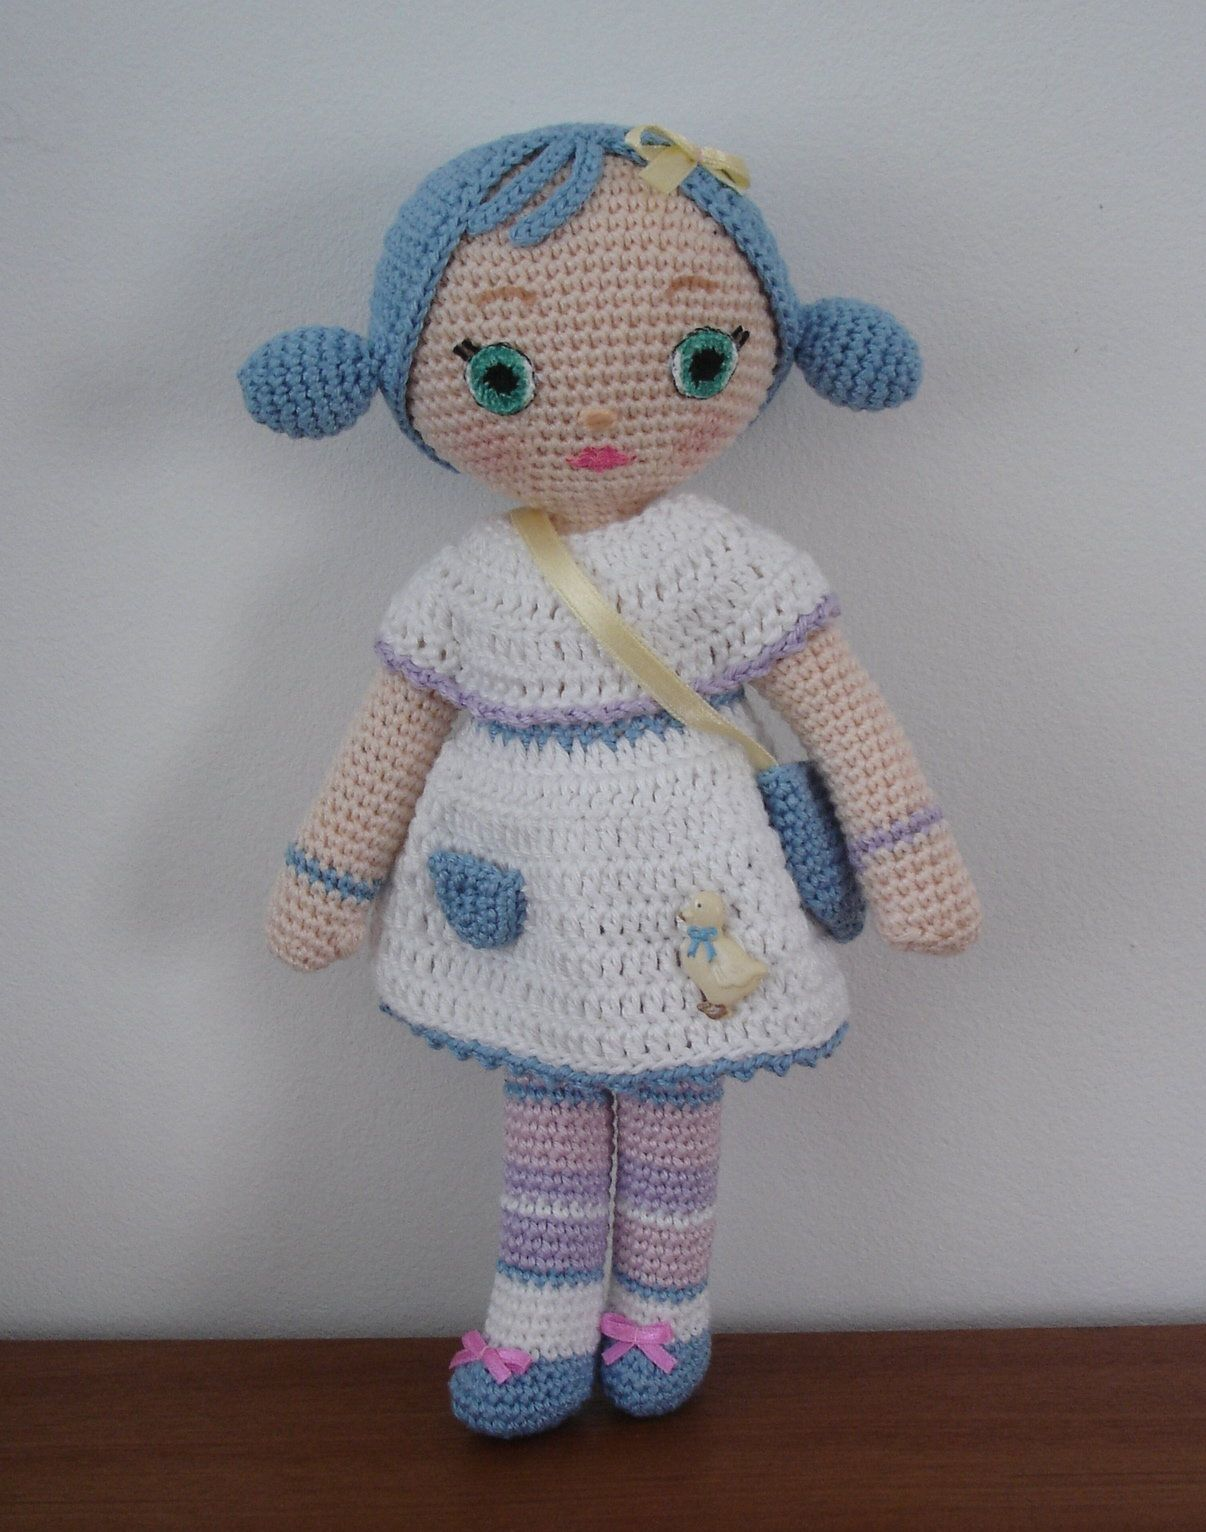 Mooshka dolls | Tutorial crochet, Amigurumi patterns and Crochet